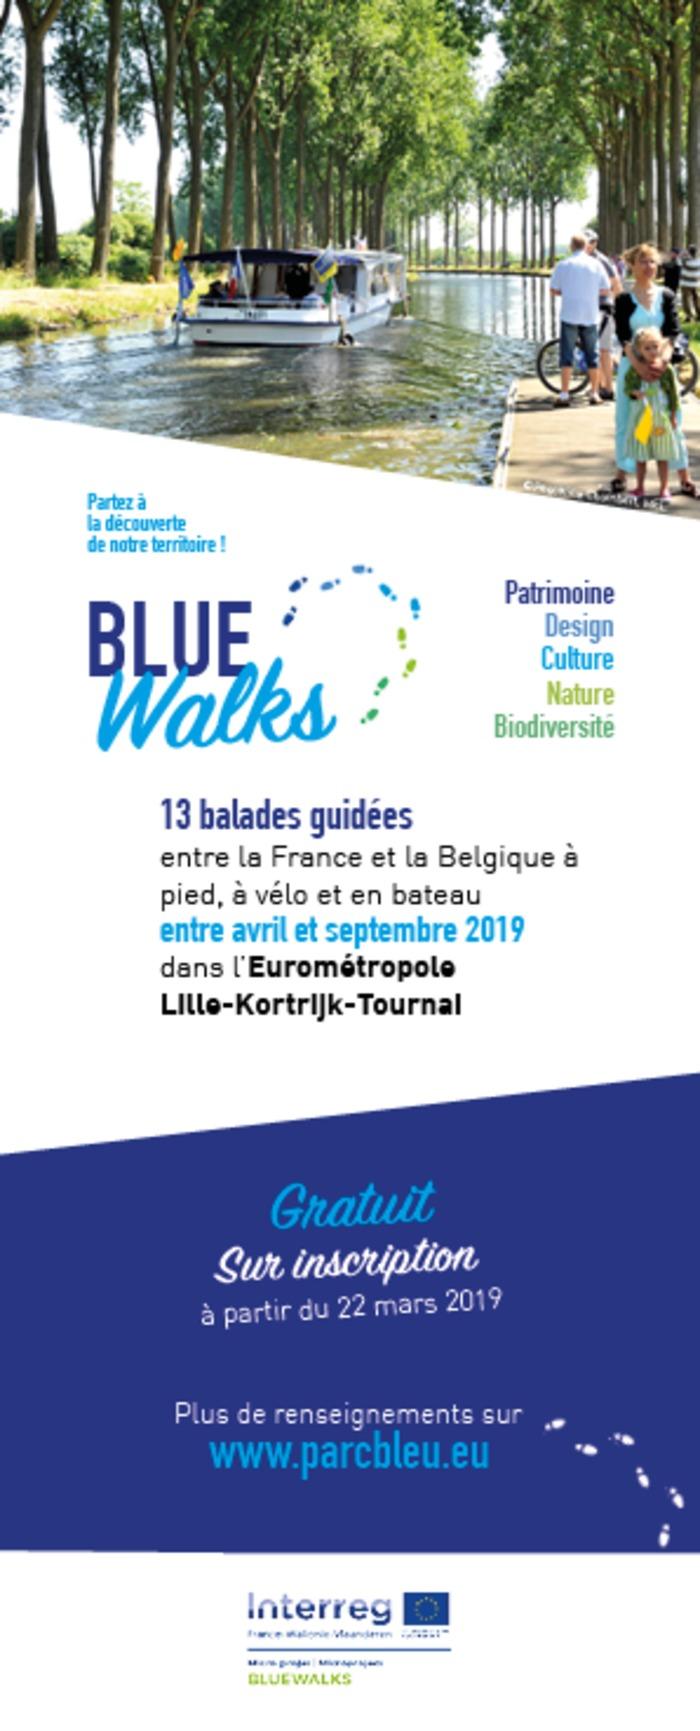 BLUEWALKS - Balade Espierres & balade des Astuces